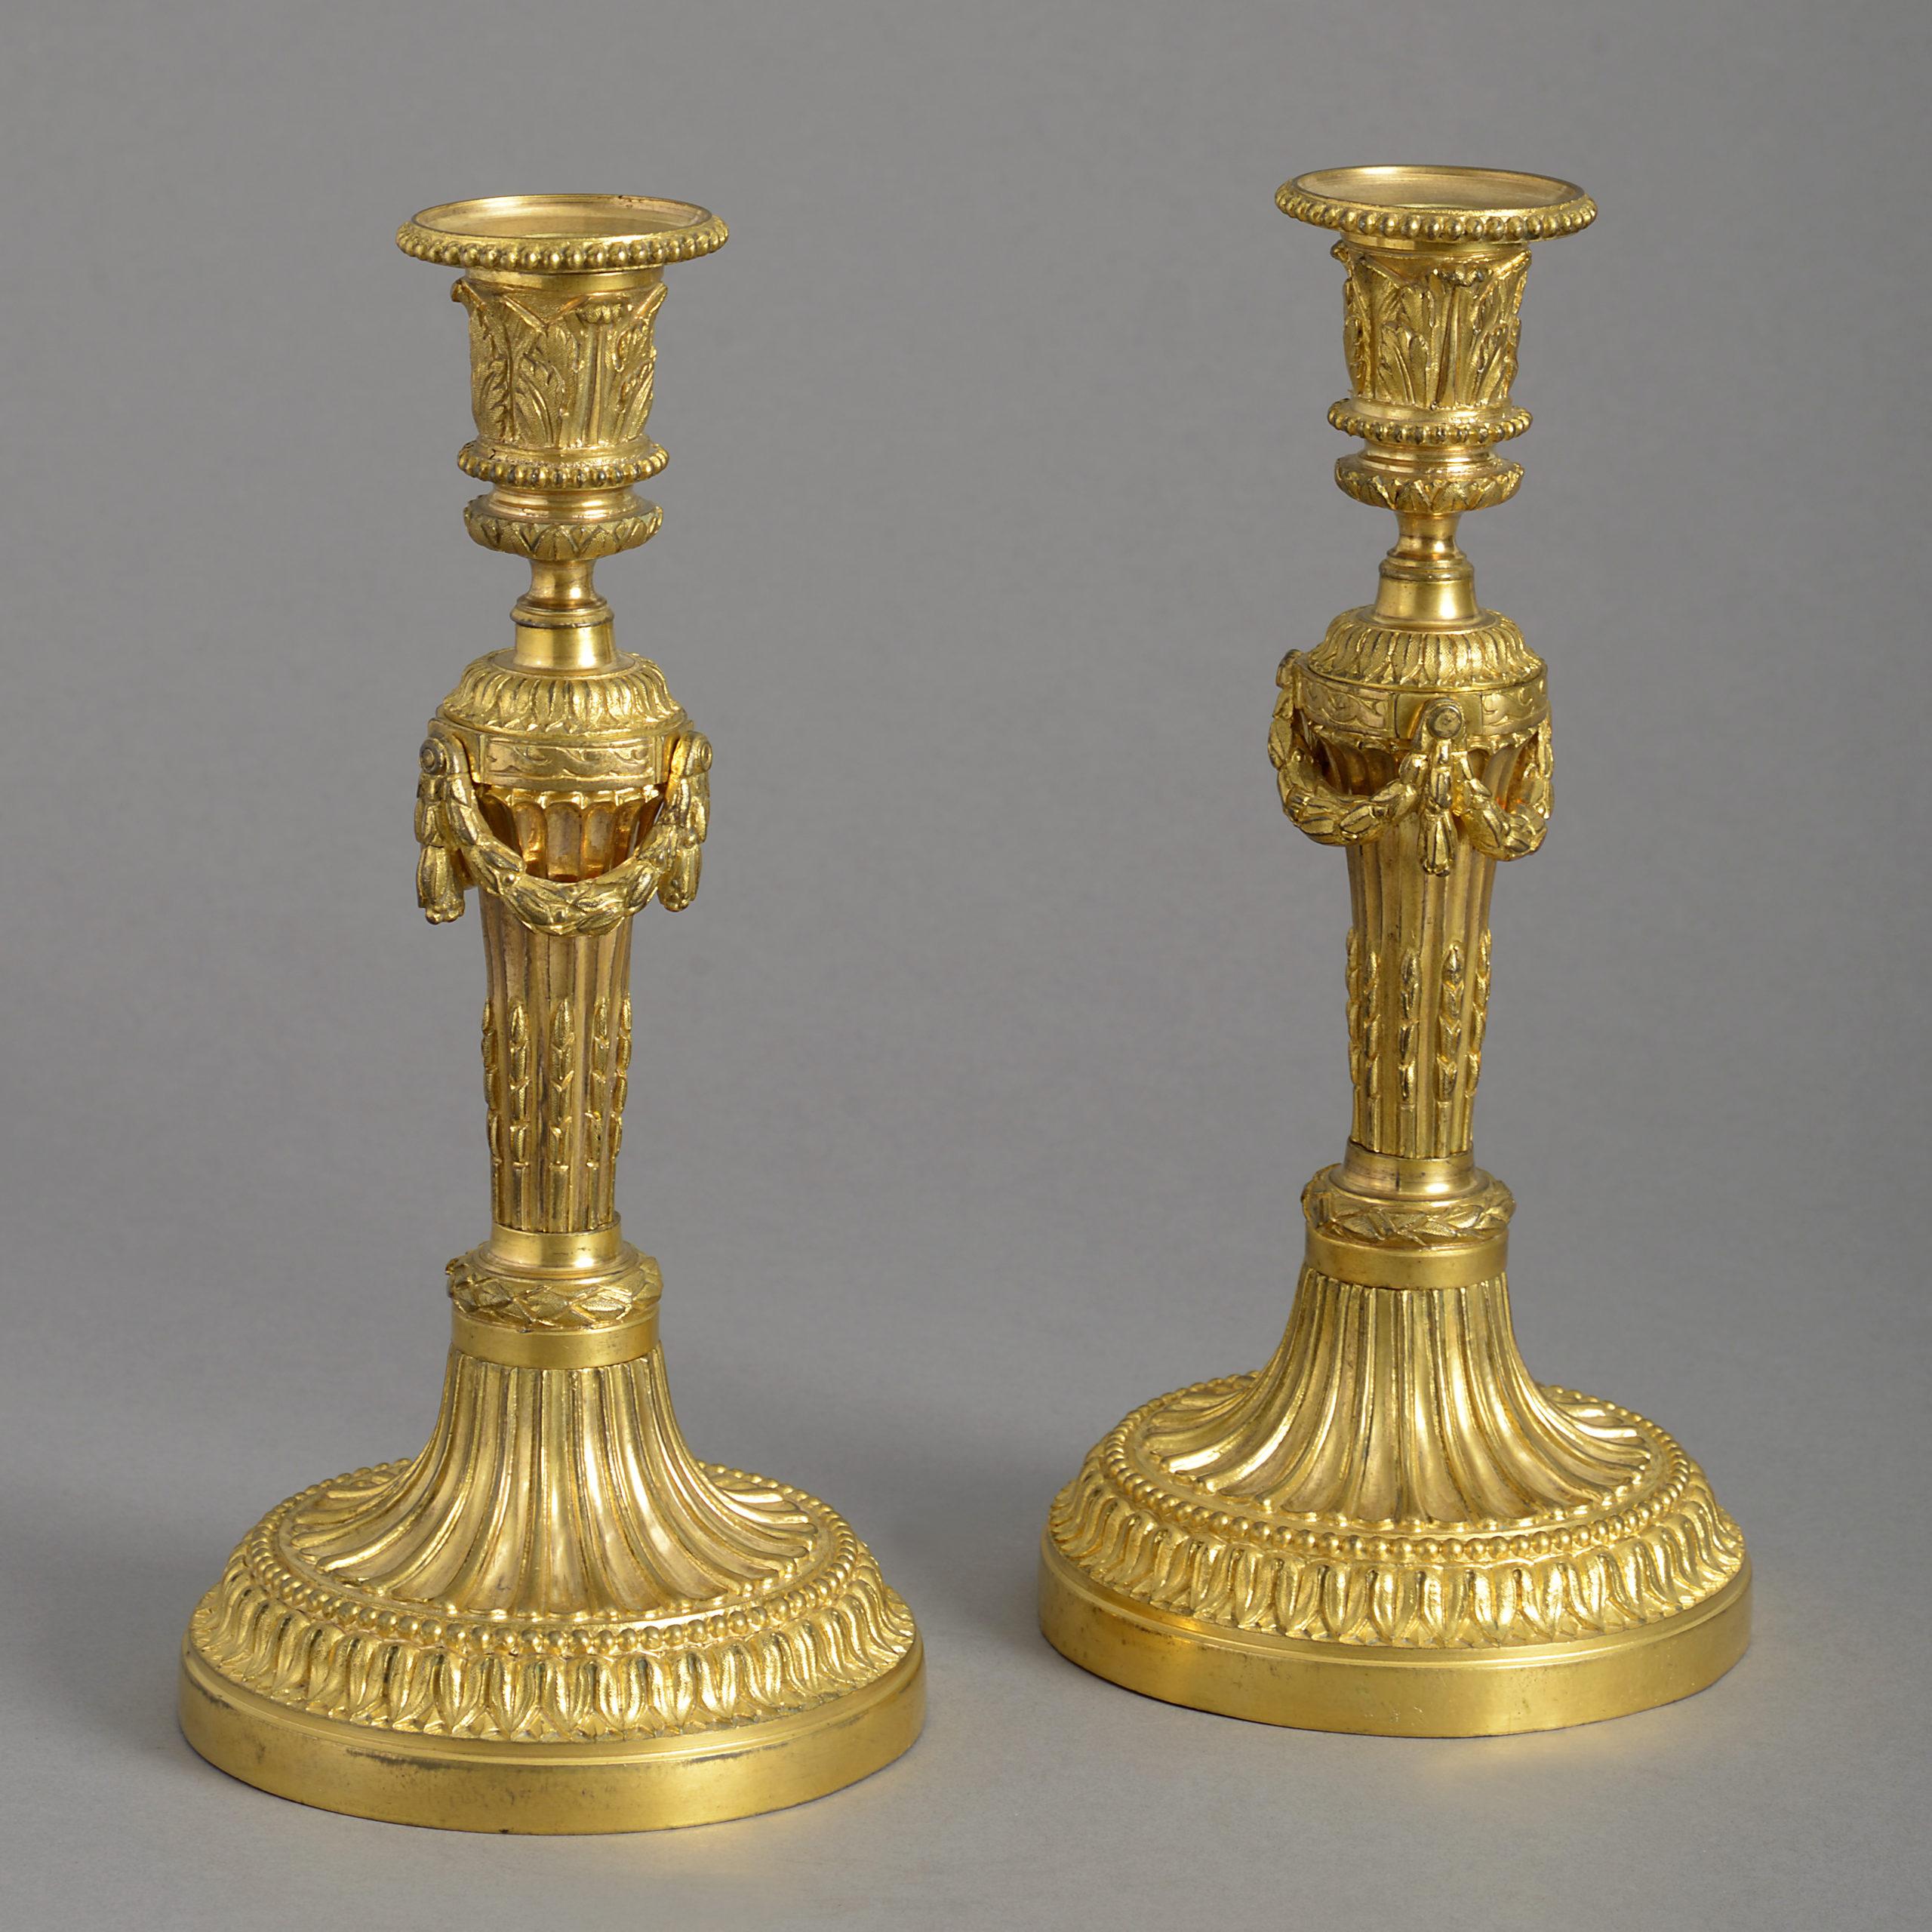 Pair of Ormolu Candlesticks